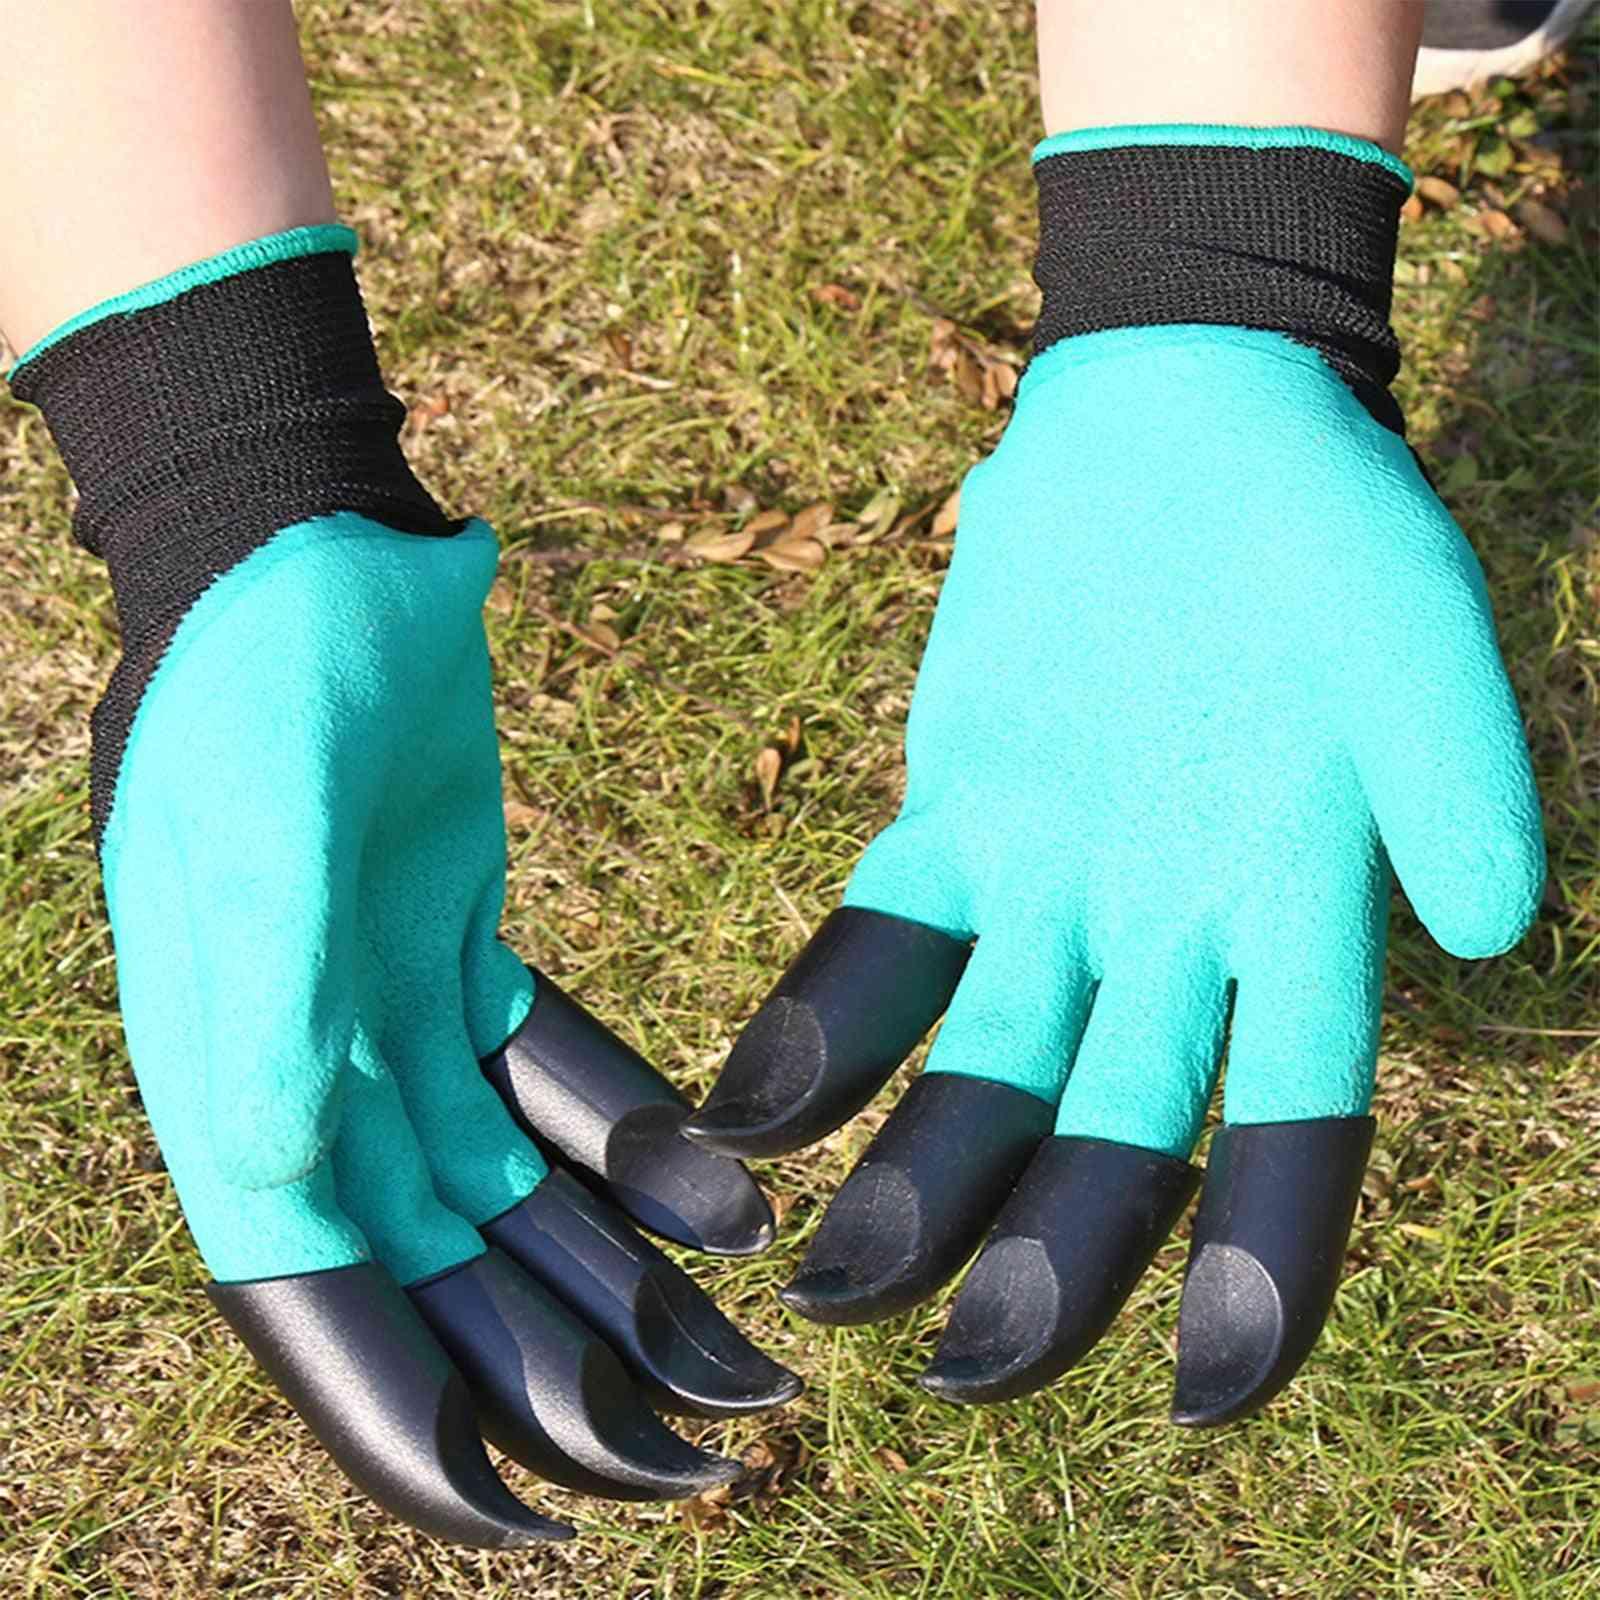 Garden Gloves With Single/double Fingertips